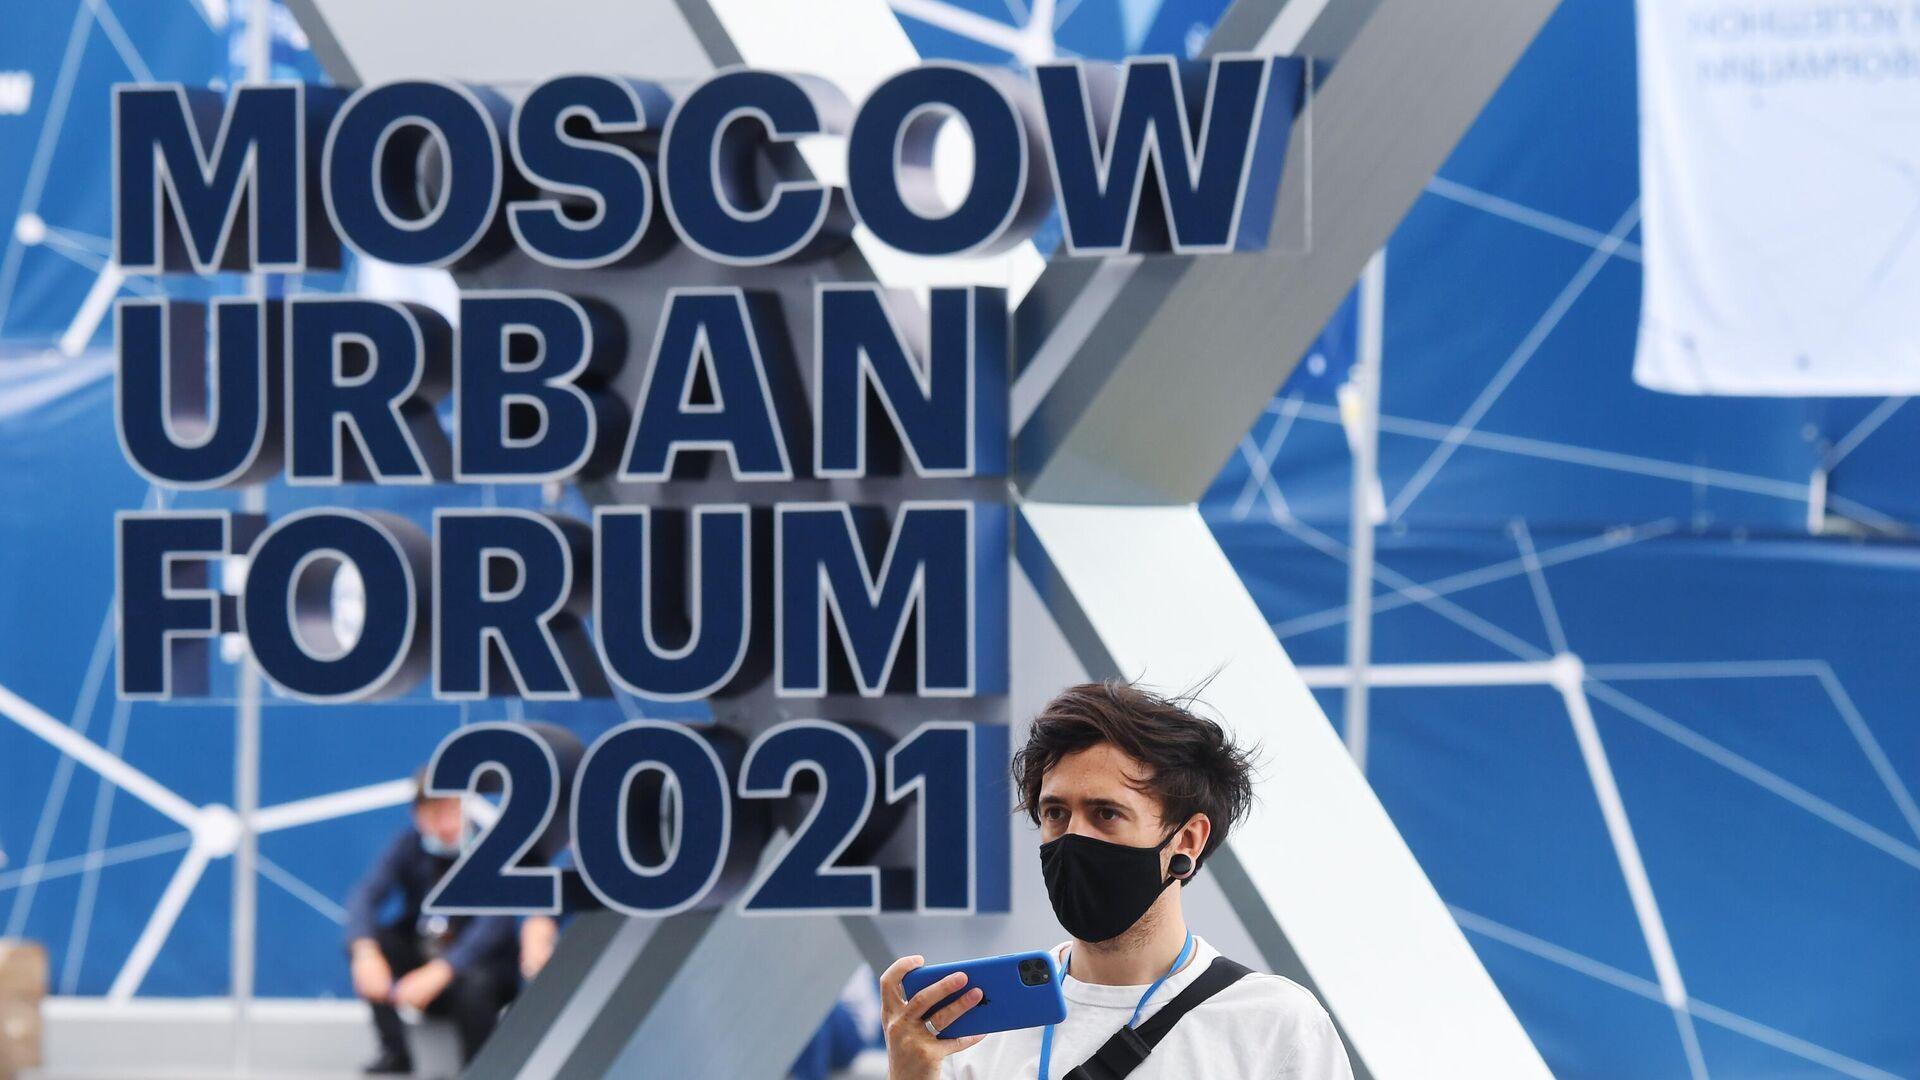 Moscow Urban Forum 2021 - РИА Новости, 1920, 02.07.2021